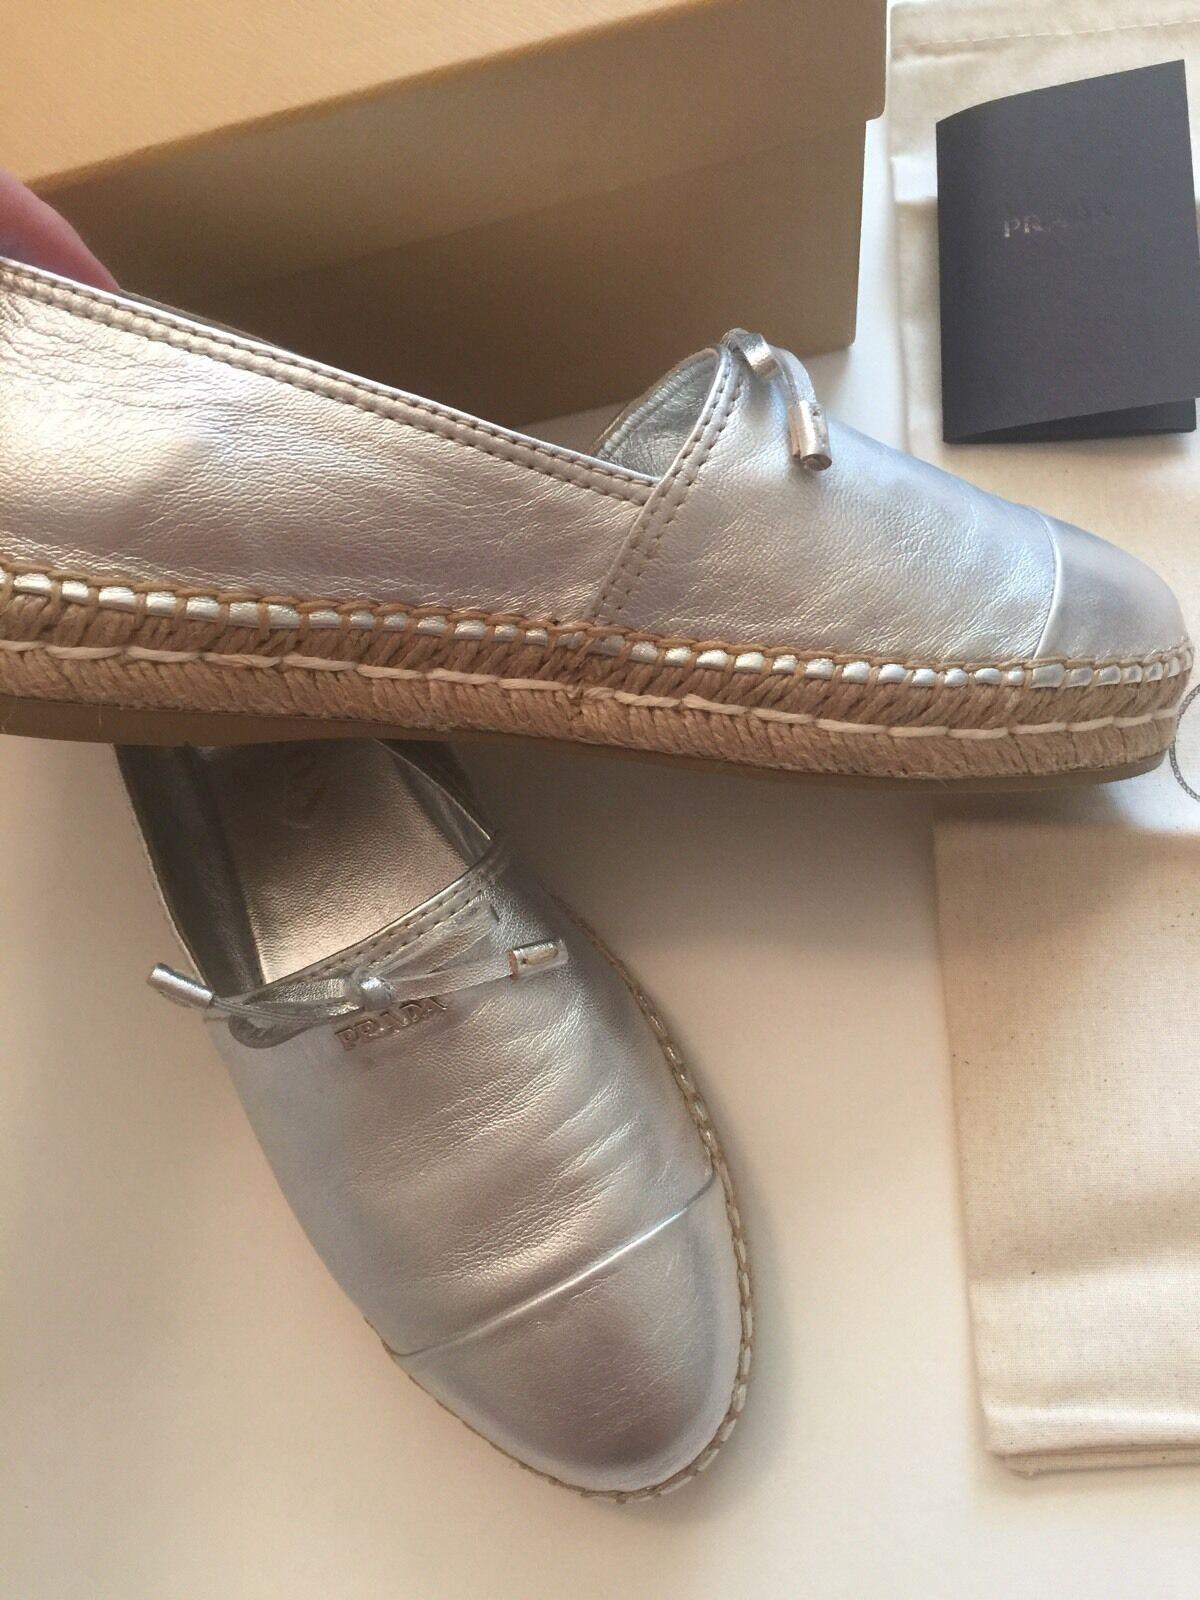 NIB Prada argent femmes Leather Espadrille Logo Logo Logo Bow slip on flat chaussures 6.5  36.5 3c68a6